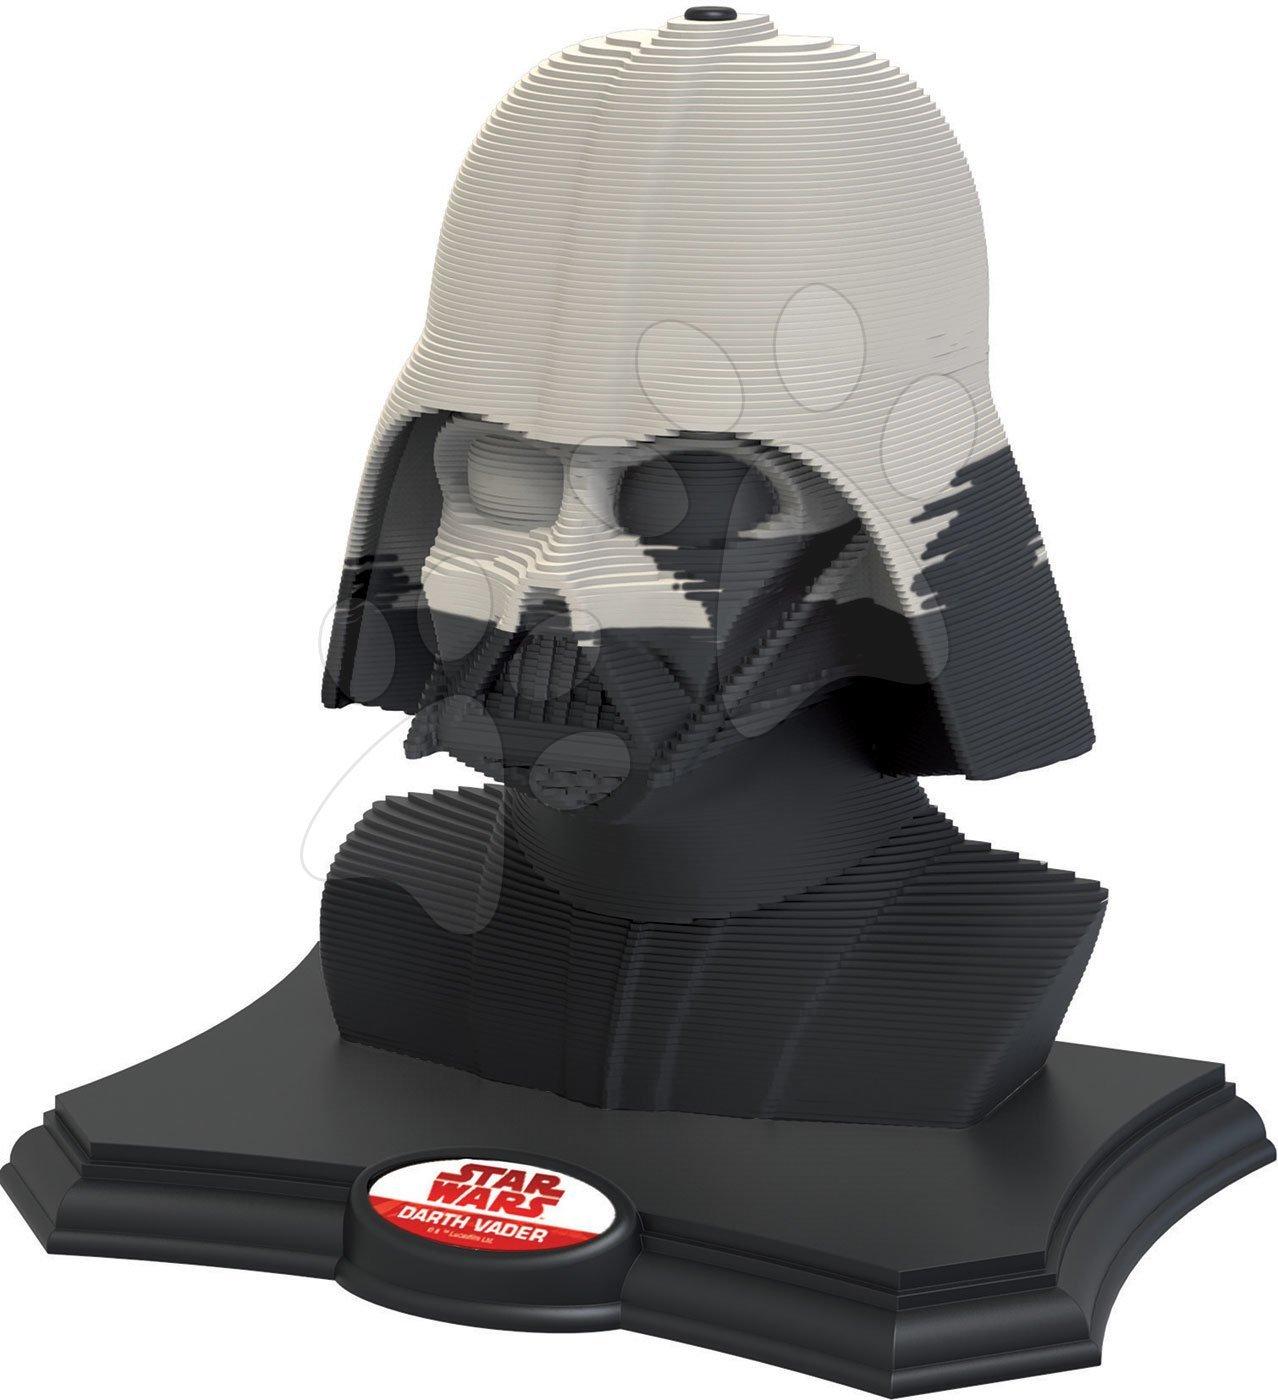 Puzzle 3D Sculpture Darth Vader Star Wars edice Educa Dark side 160 dílků